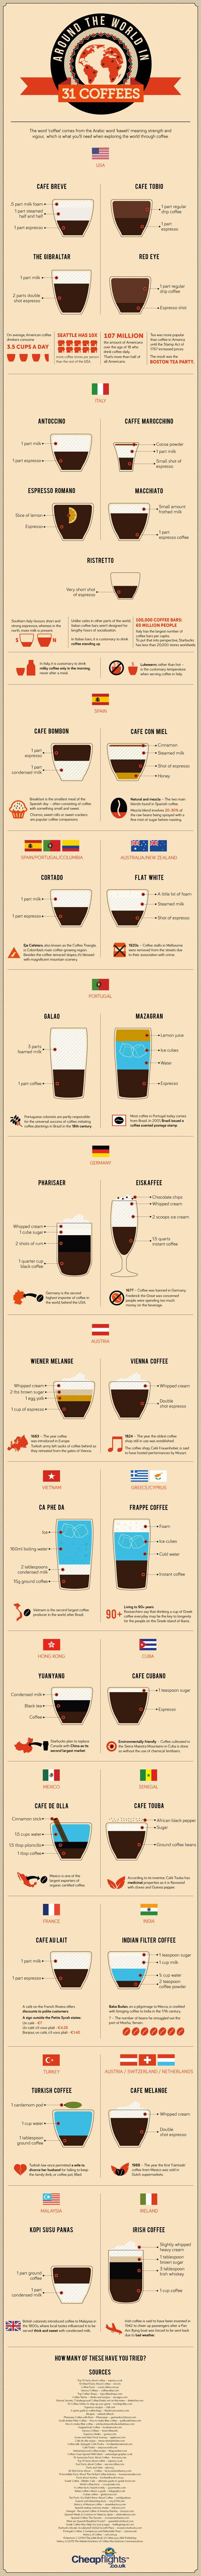 31-coffees-around-the-world